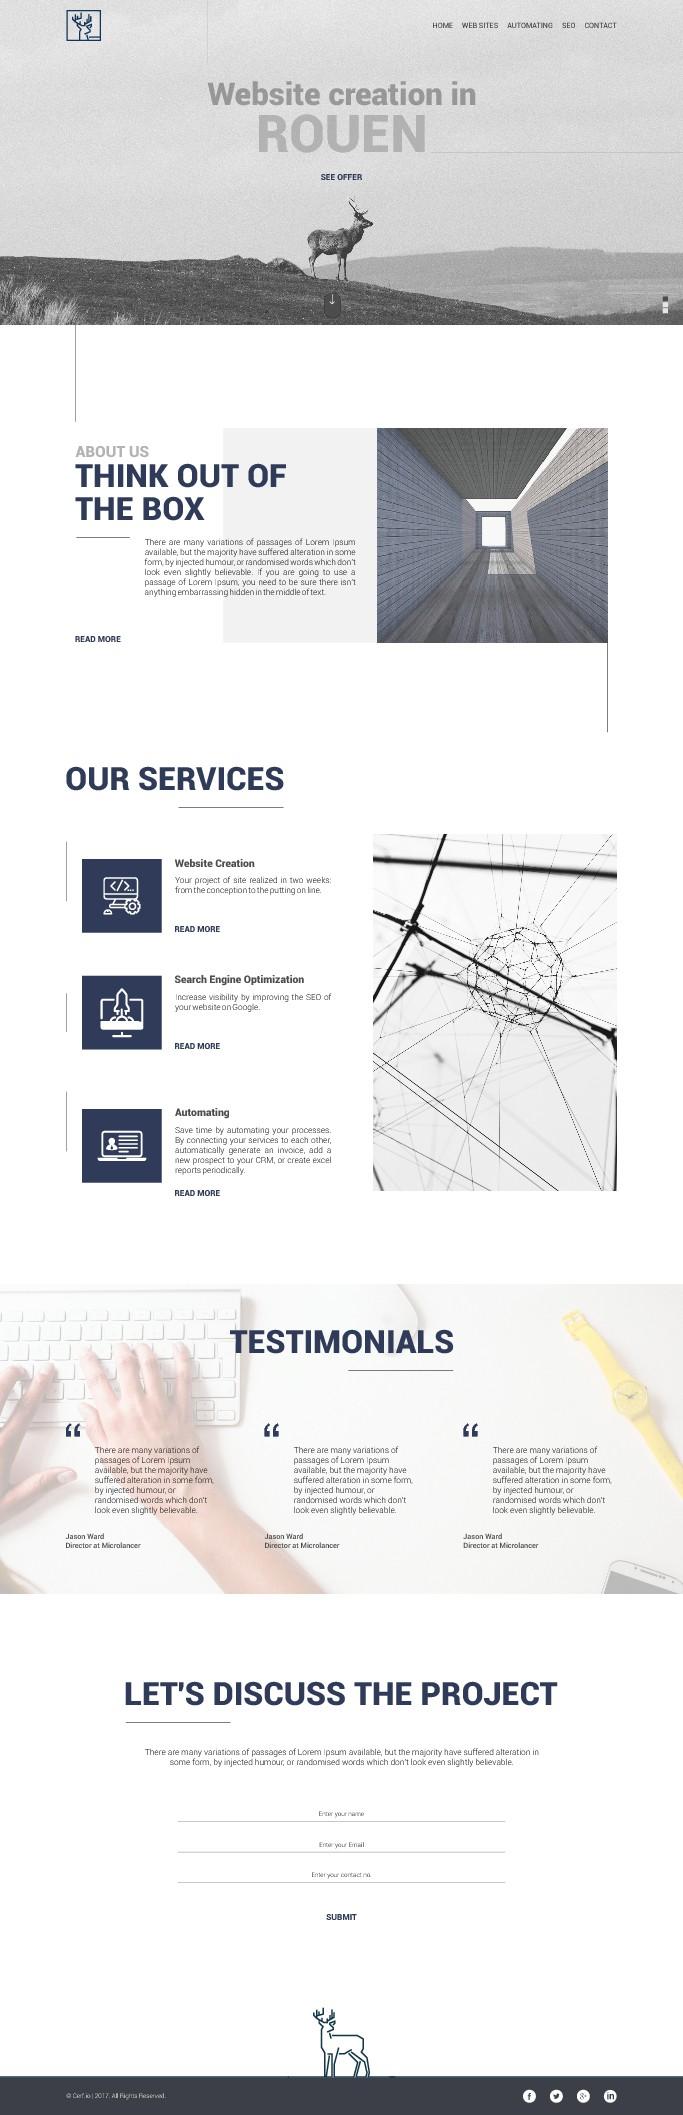 Design a minimalist website for a web agency